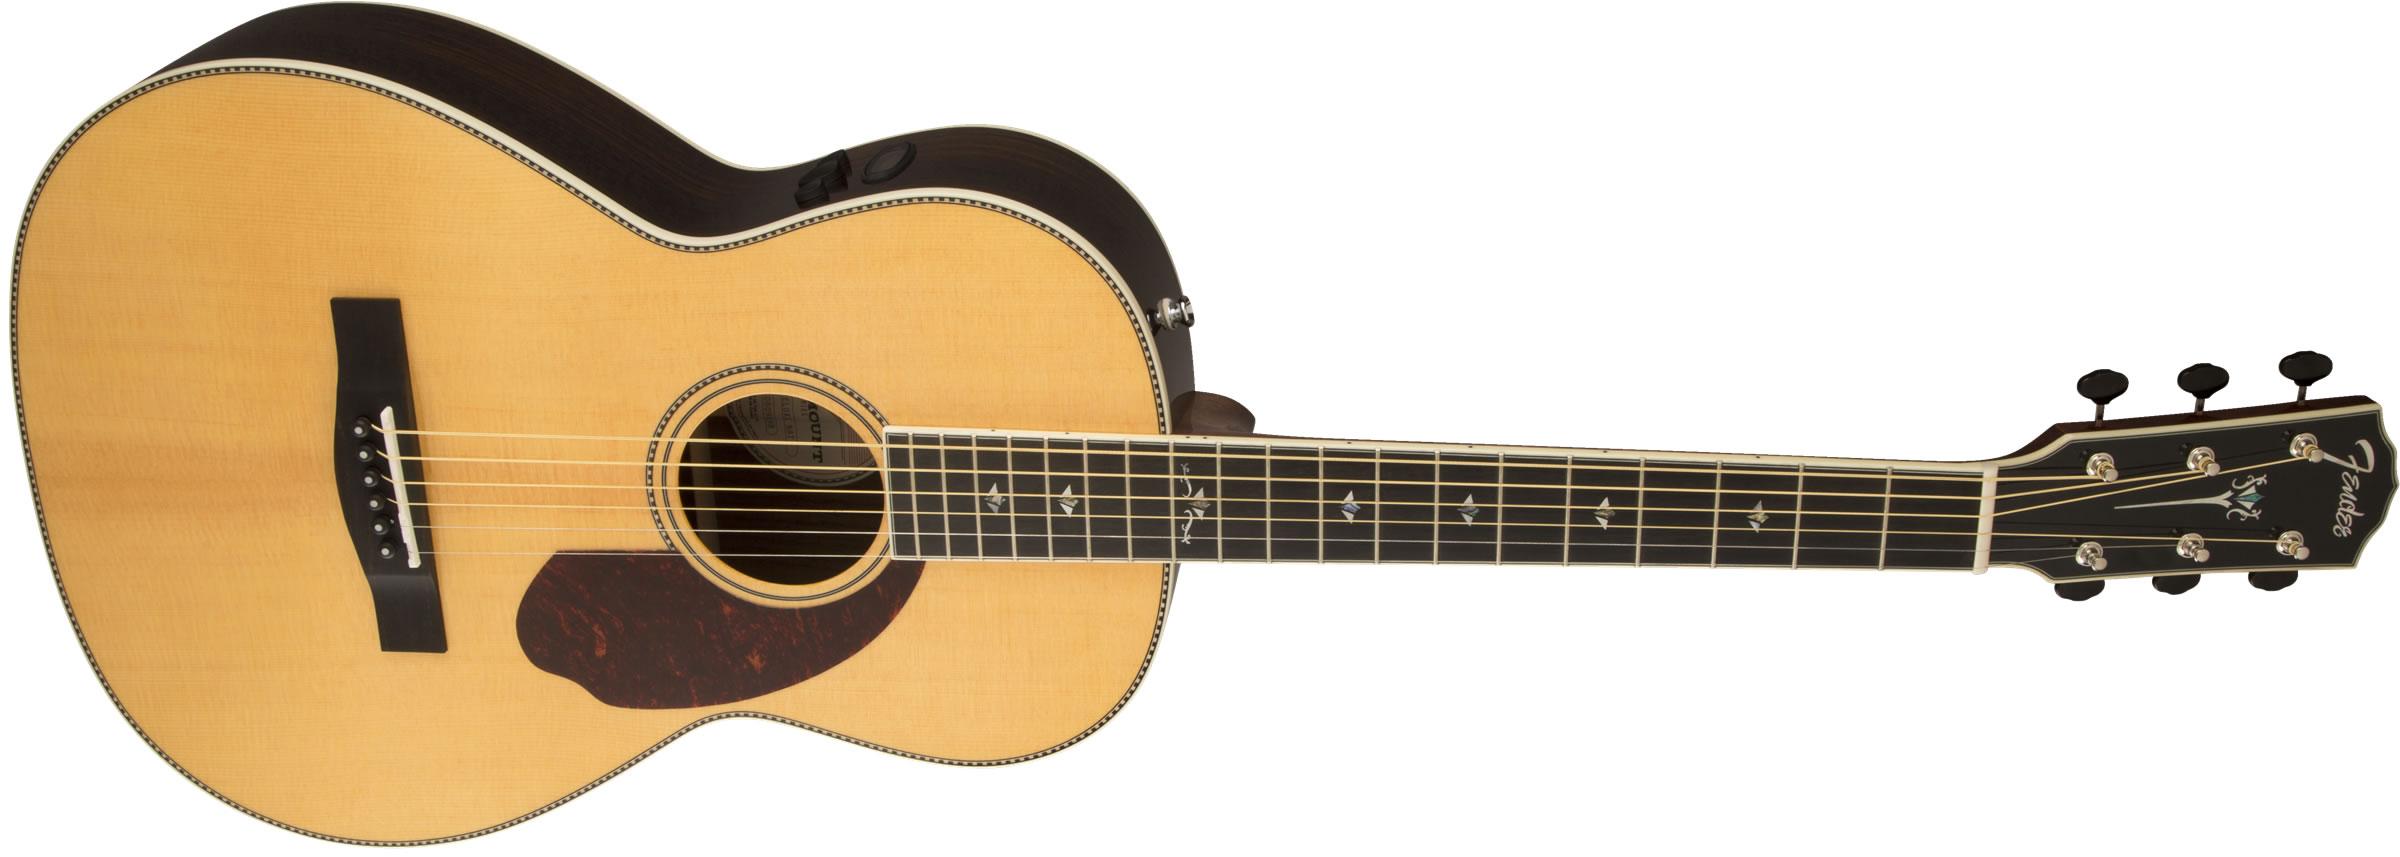 fender paramount series pm 2 deluxe parlor natural elektro akustik gitar. Black Bedroom Furniture Sets. Home Design Ideas